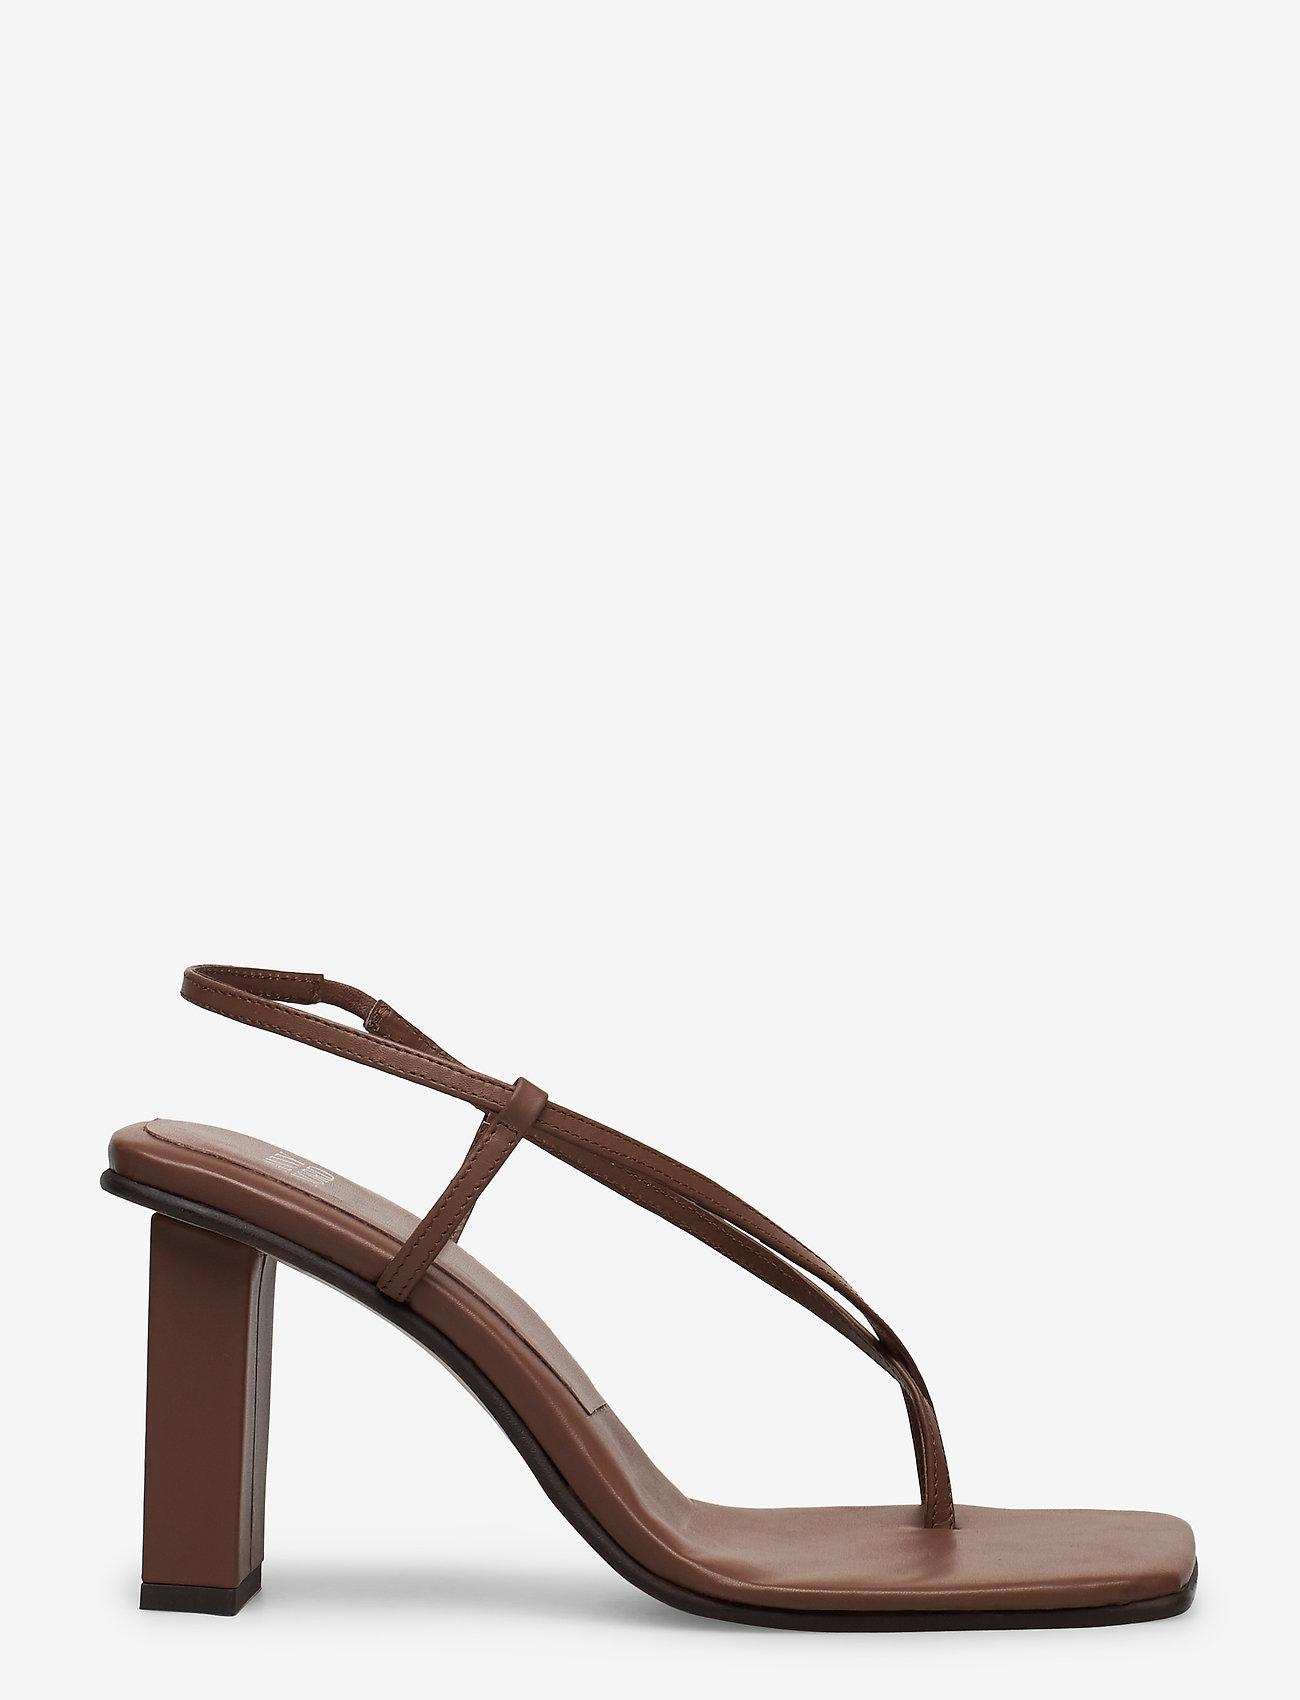 ANNY NORD - NEVER WRONG THONG - högklackade sandaler - 80 brown - 1